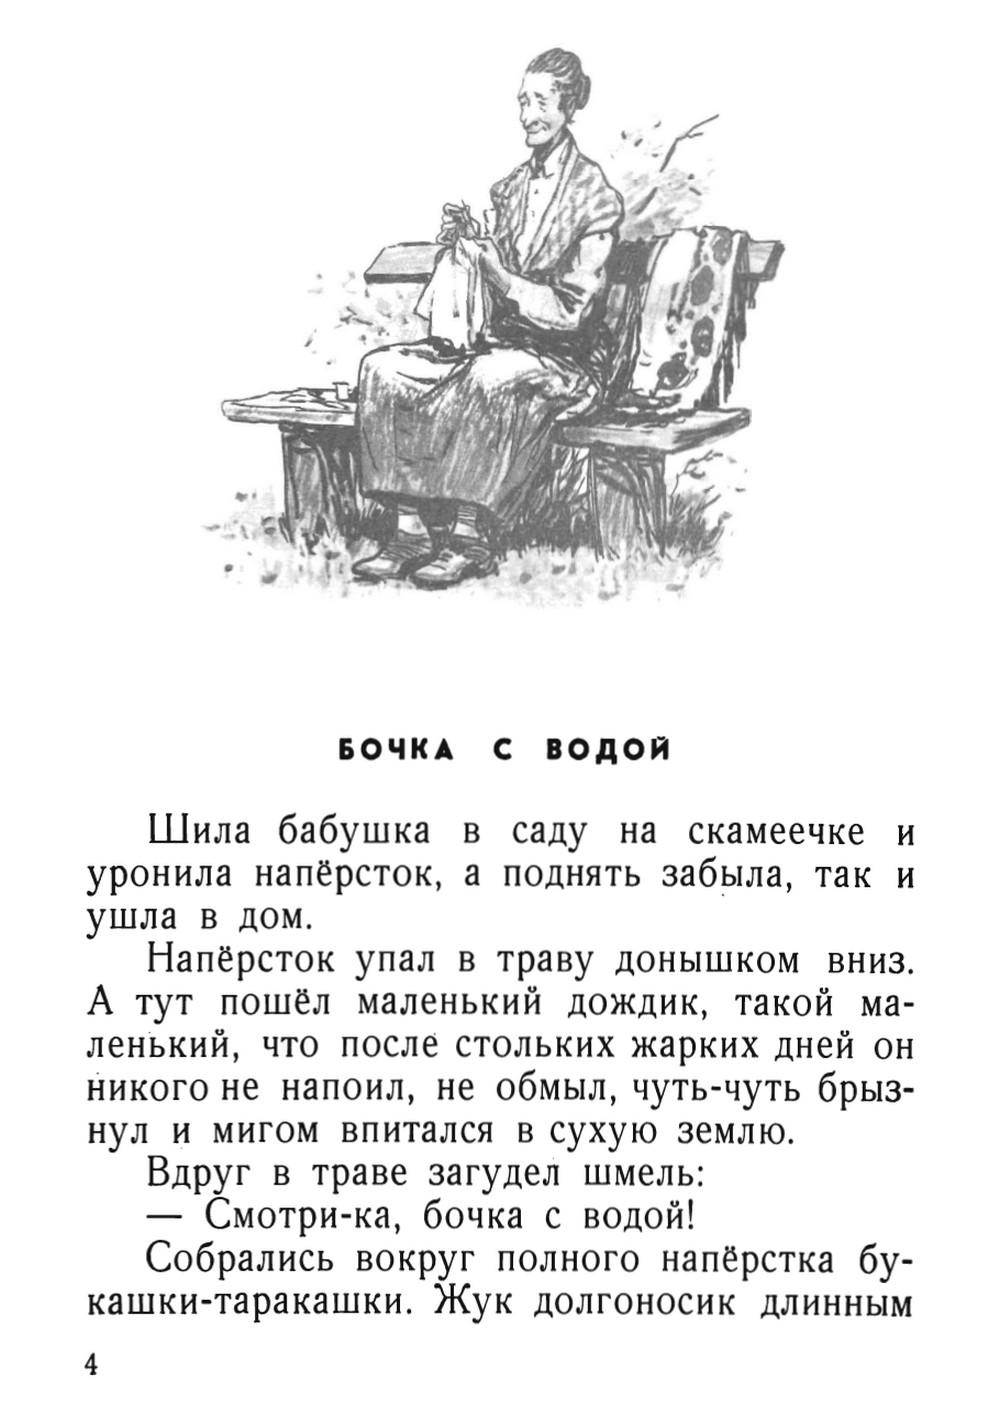 http://i2.imageban.ru/out/2013/09/22/77458175f7418c8f25e1df0e4debe6b7.jpg